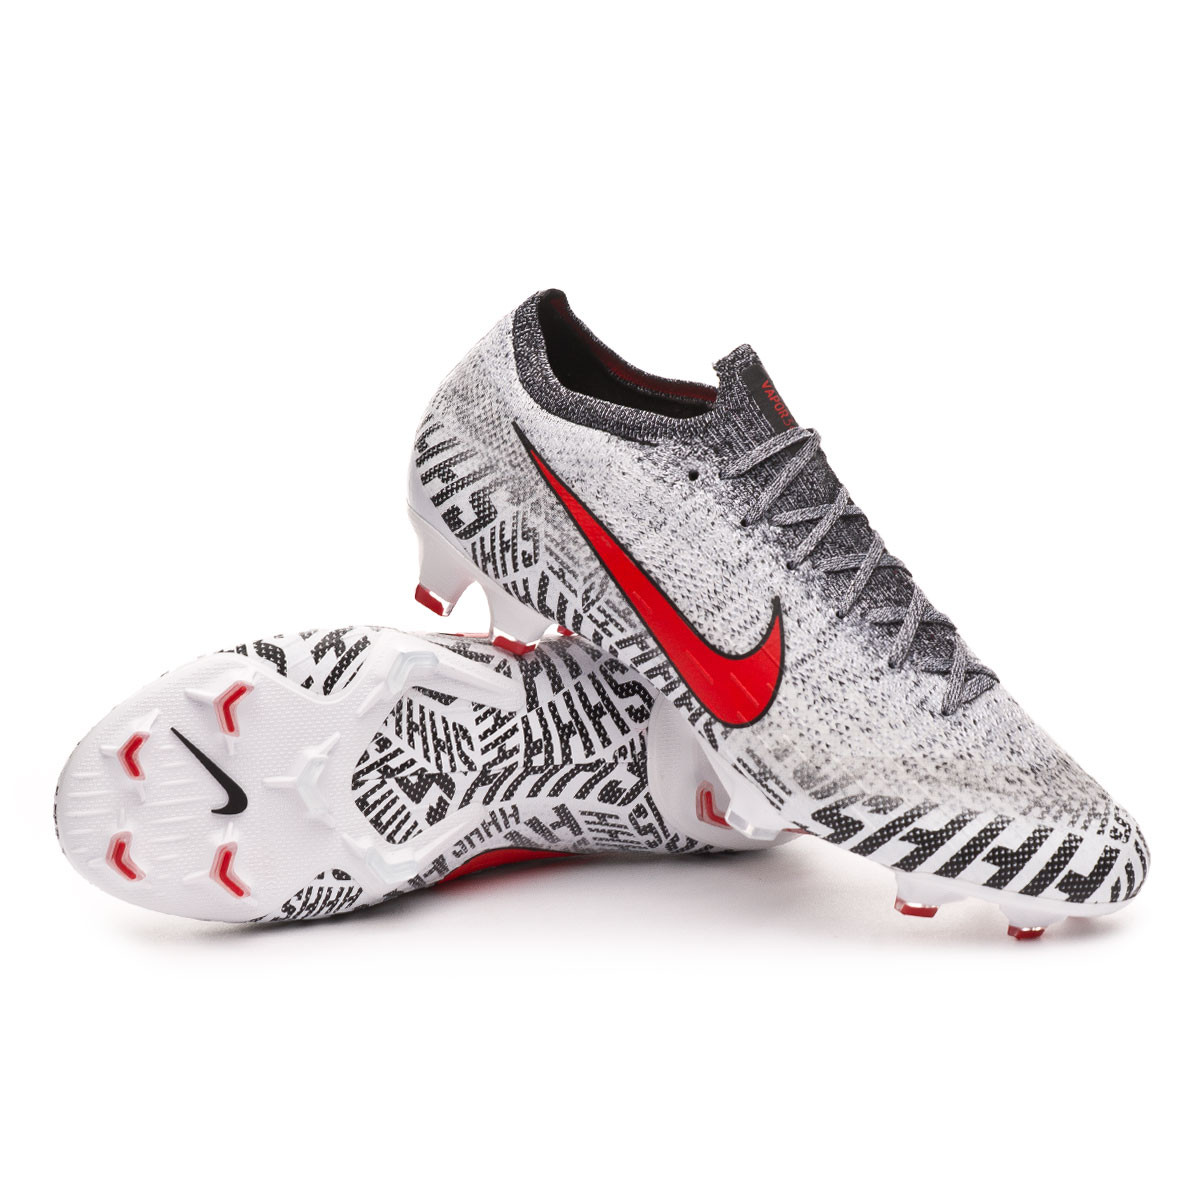 Nike Zapatos de Fútbol Mercurial Vapor XII Elite FG Neymar 2019